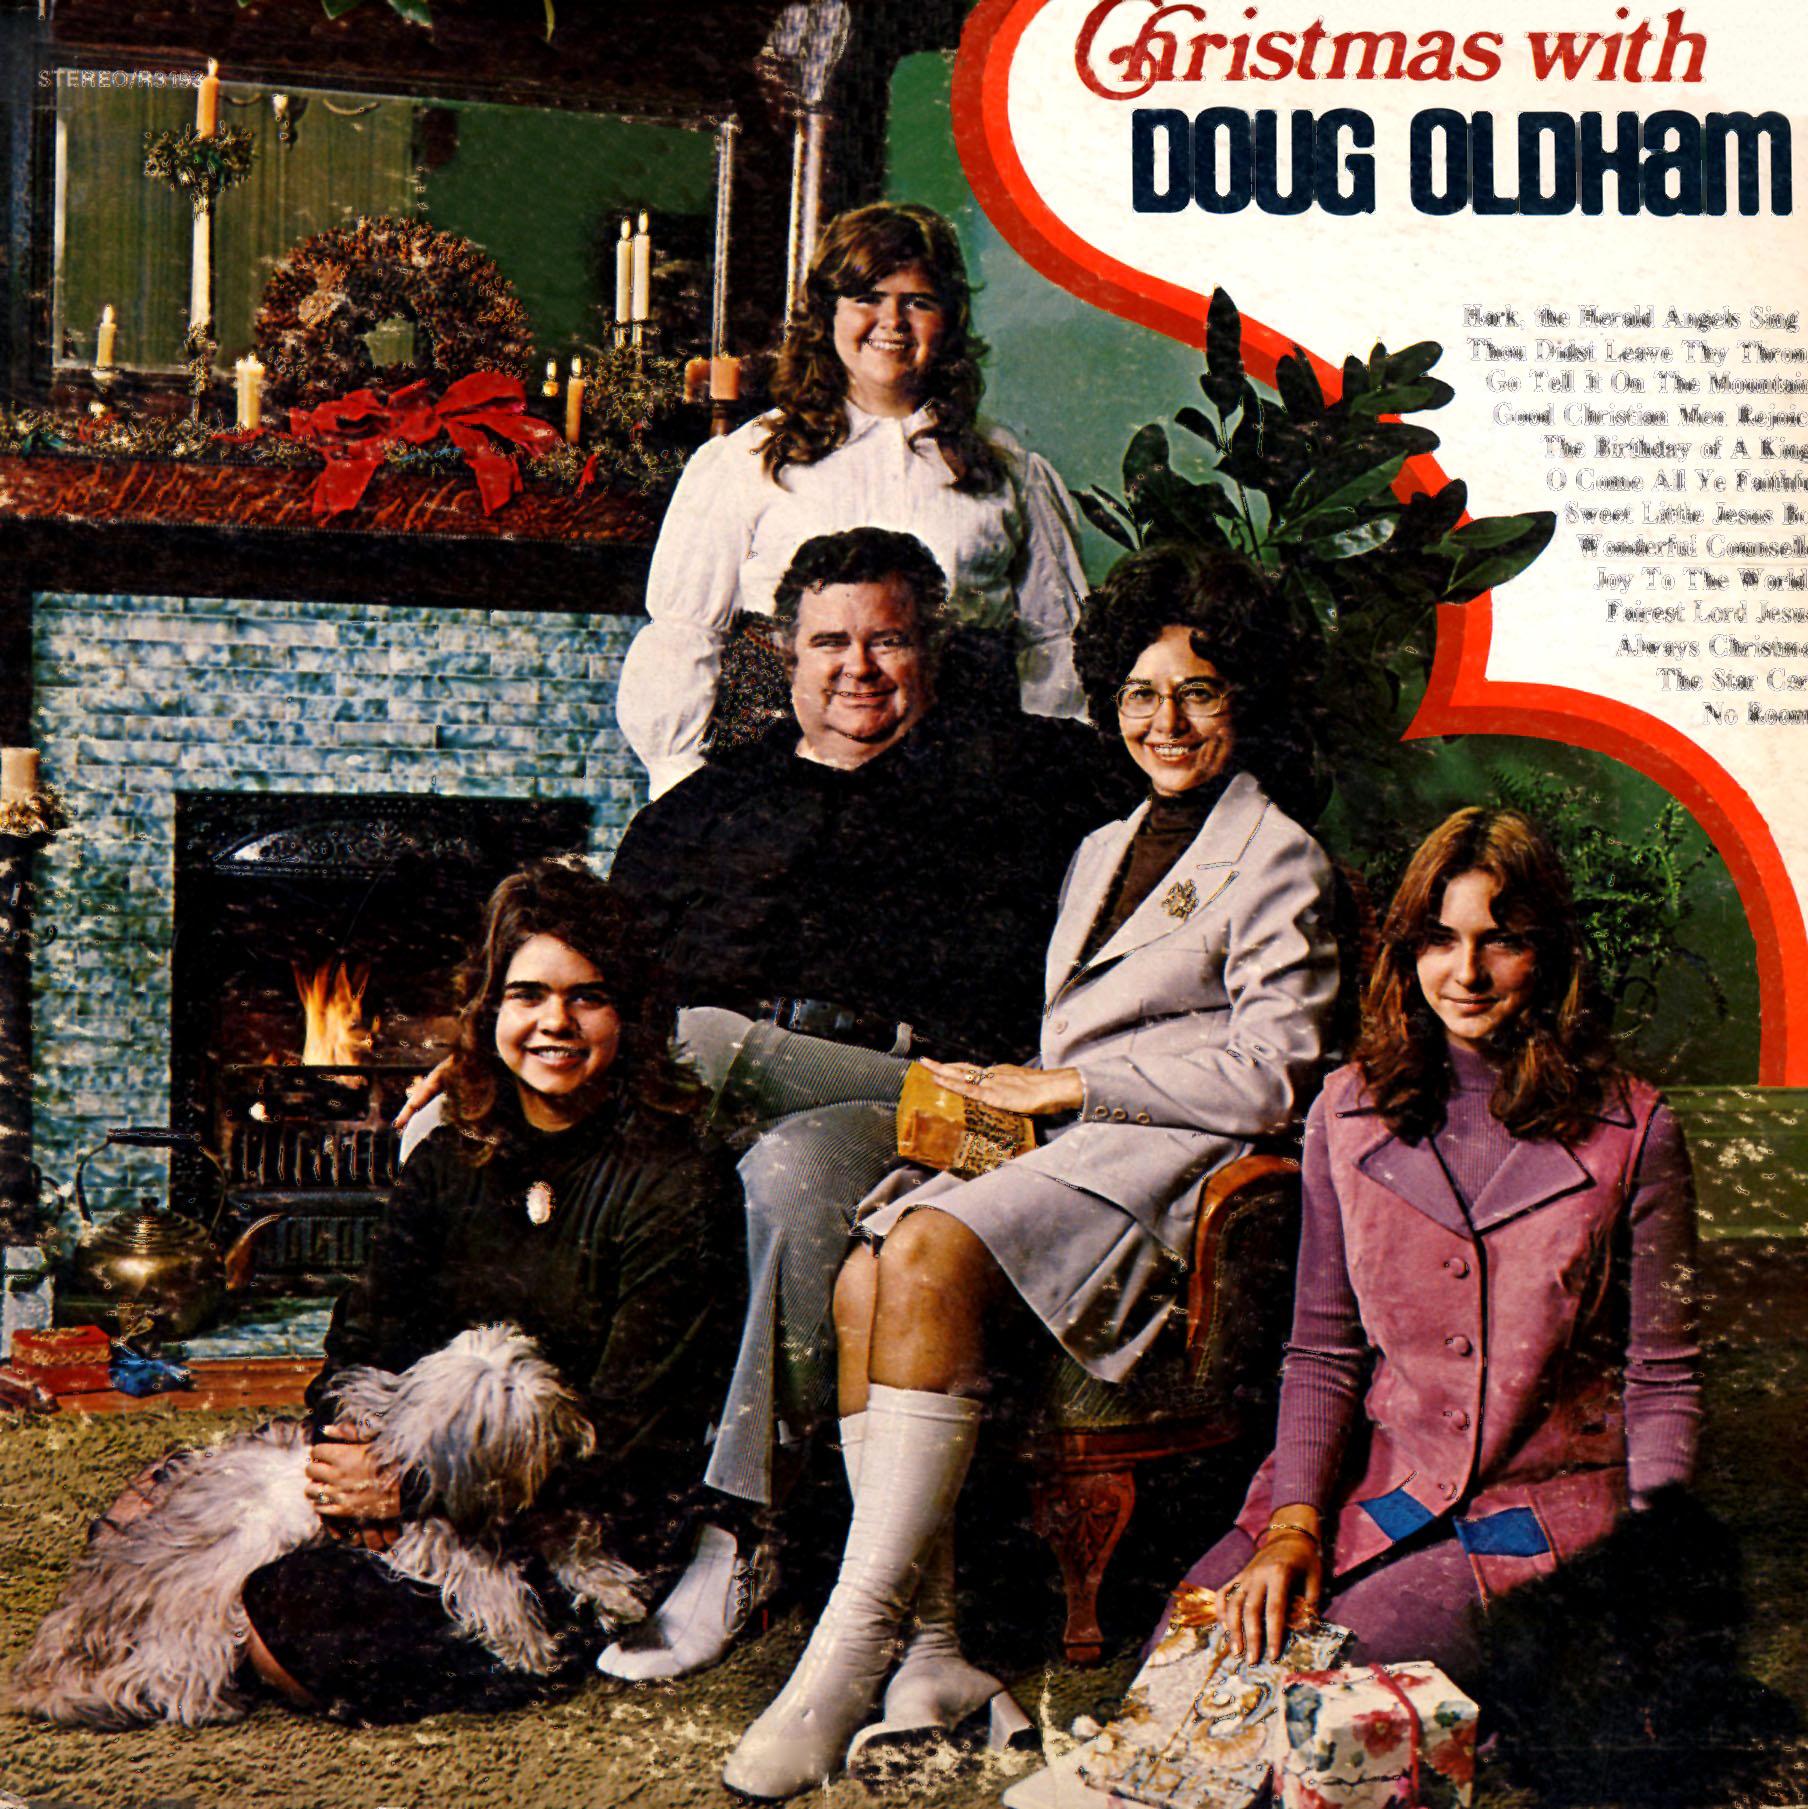 Doug Oldham - I've Got To Go On